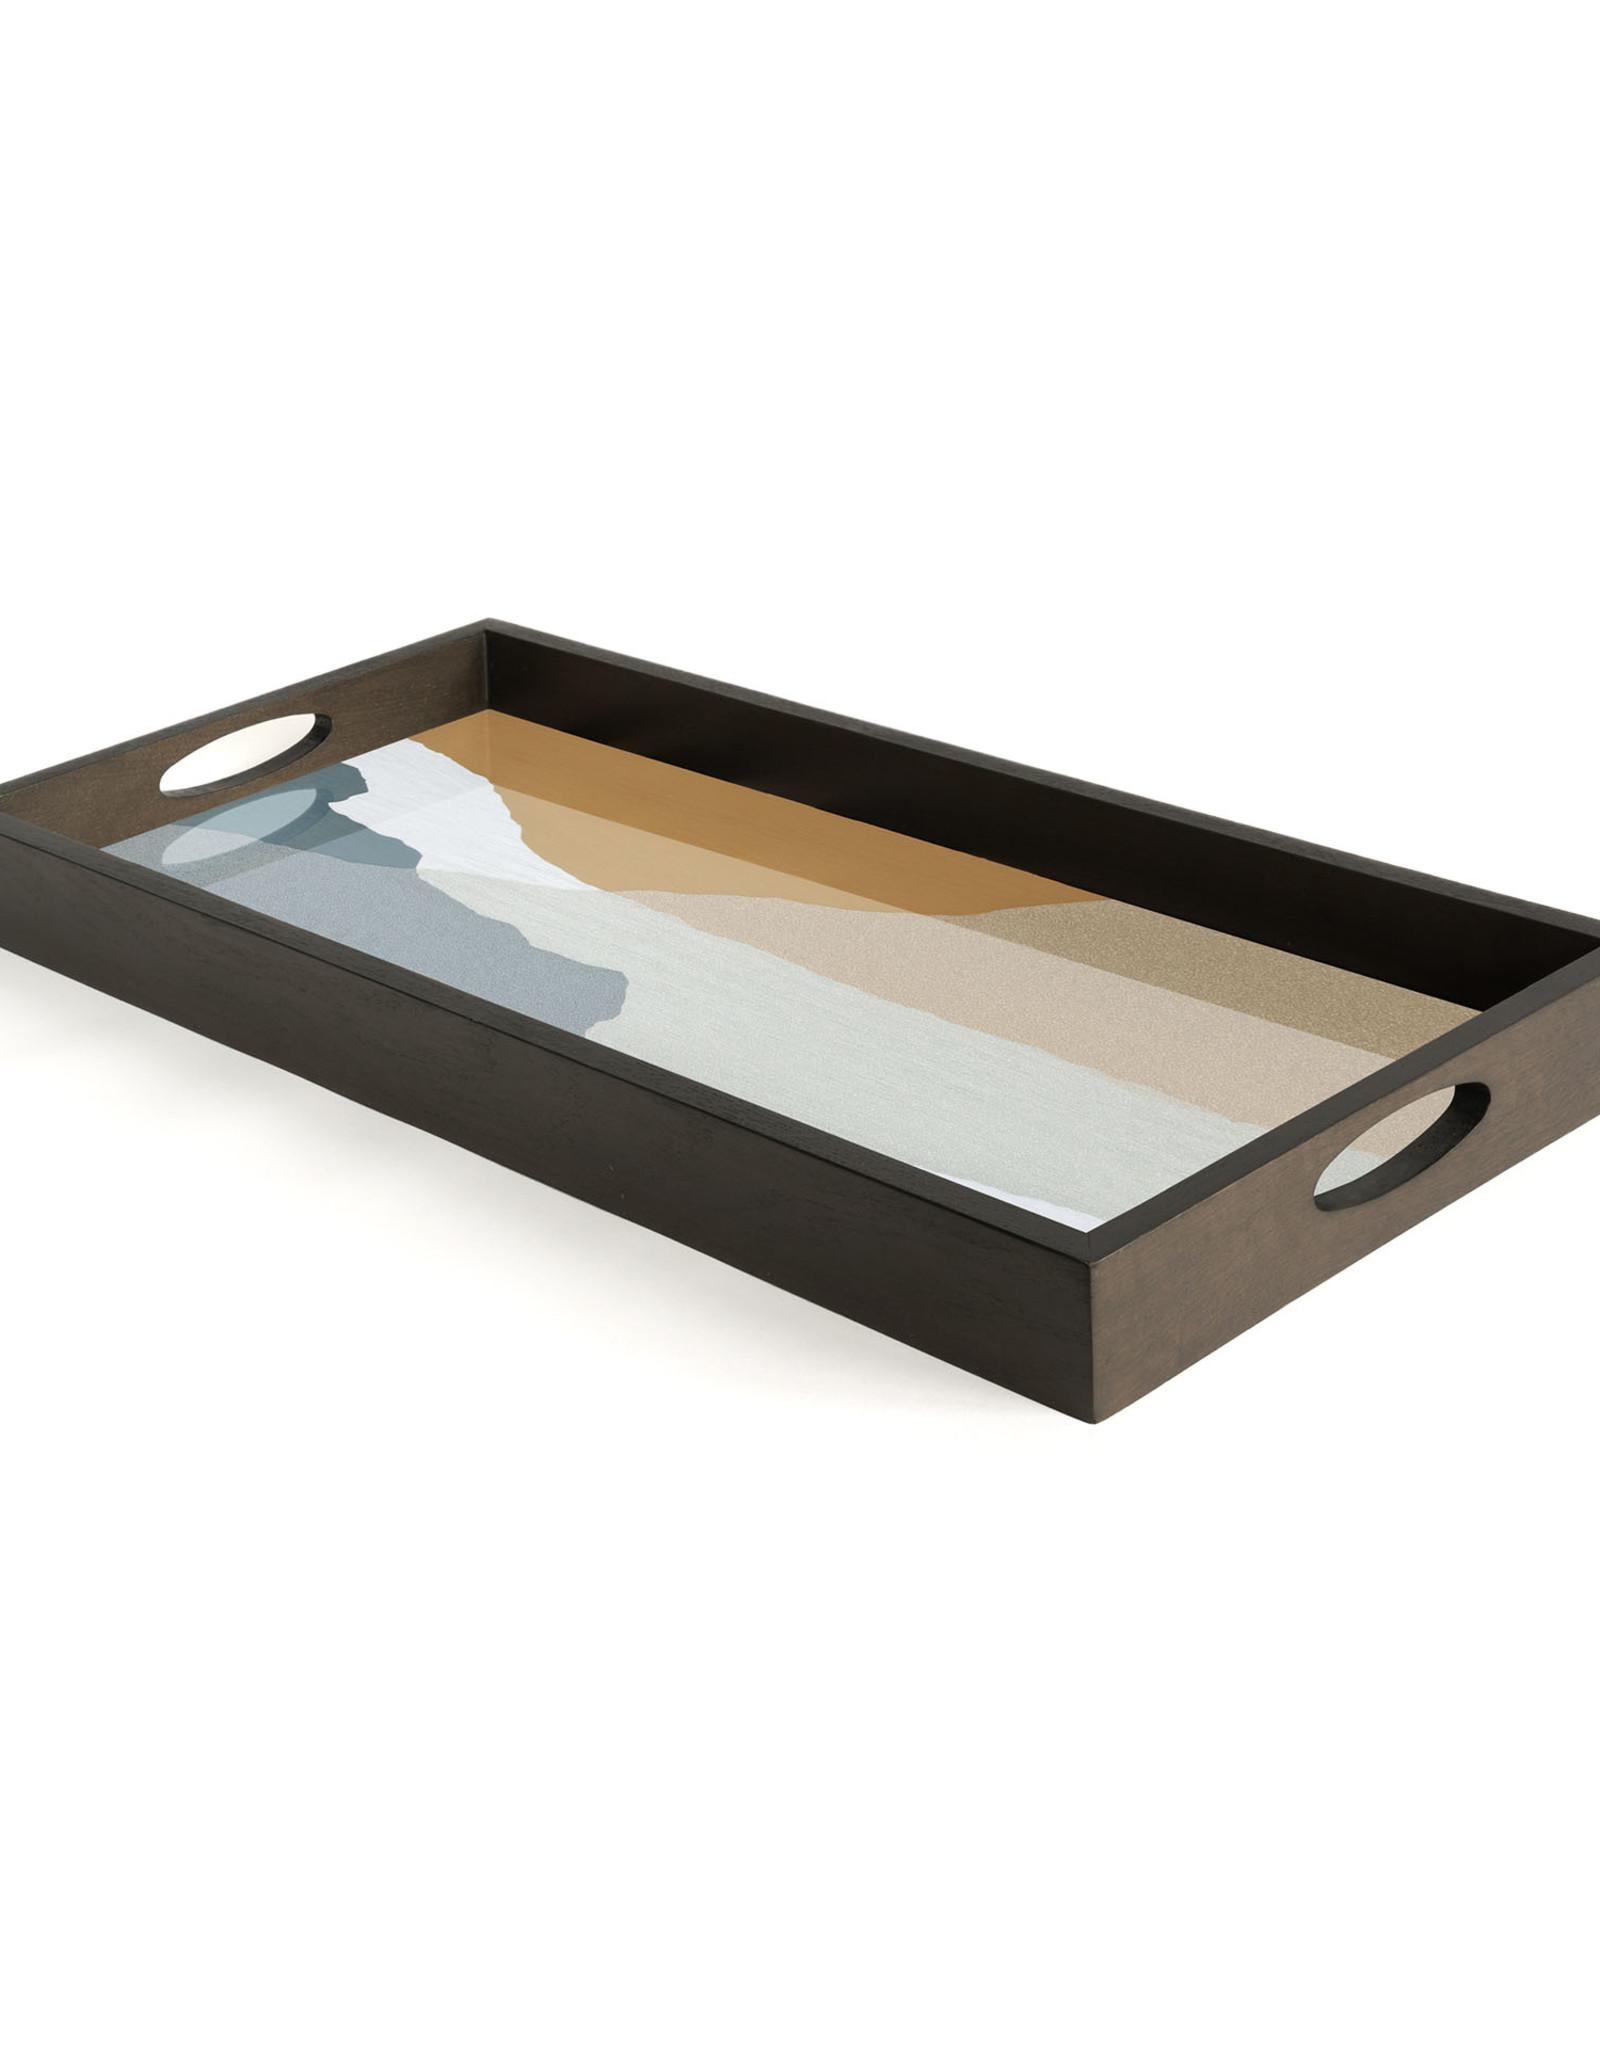 Slate Wabi Sabi glass tray - rectangular - M 27 x 12 x 2